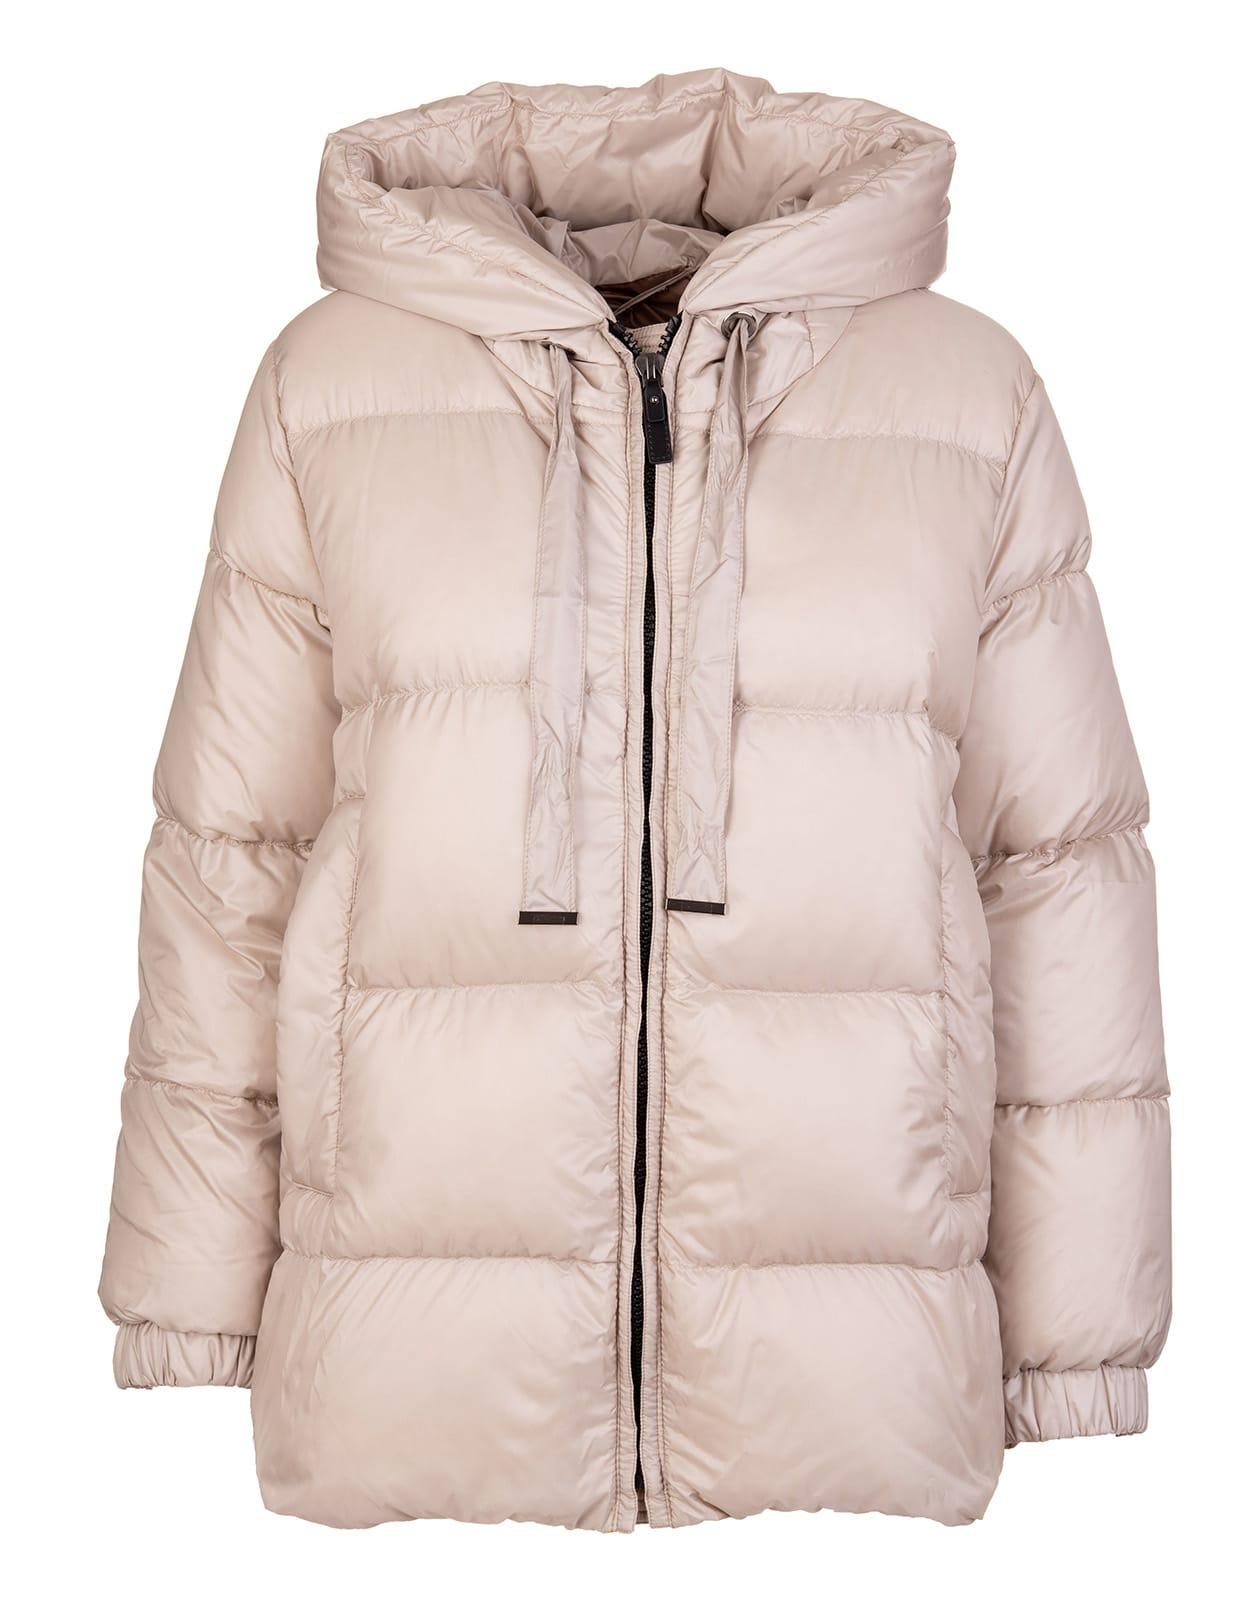 Light-colored Seia Down Jacket